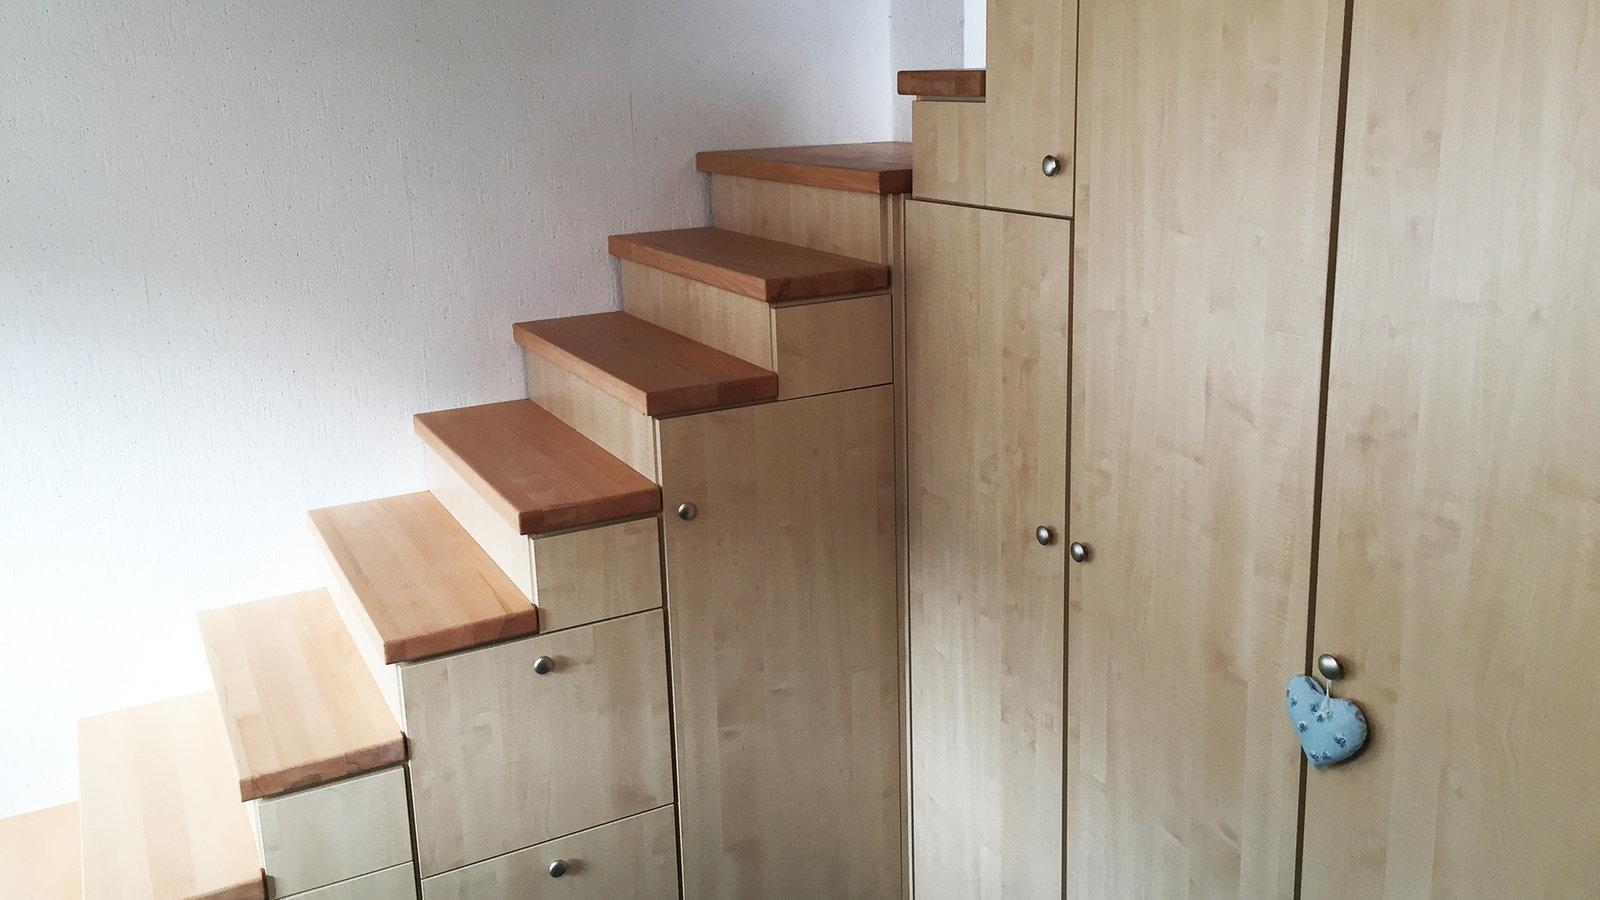 begehbarer schrank mal anders servicezeit sendungen a. Black Bedroom Furniture Sets. Home Design Ideas